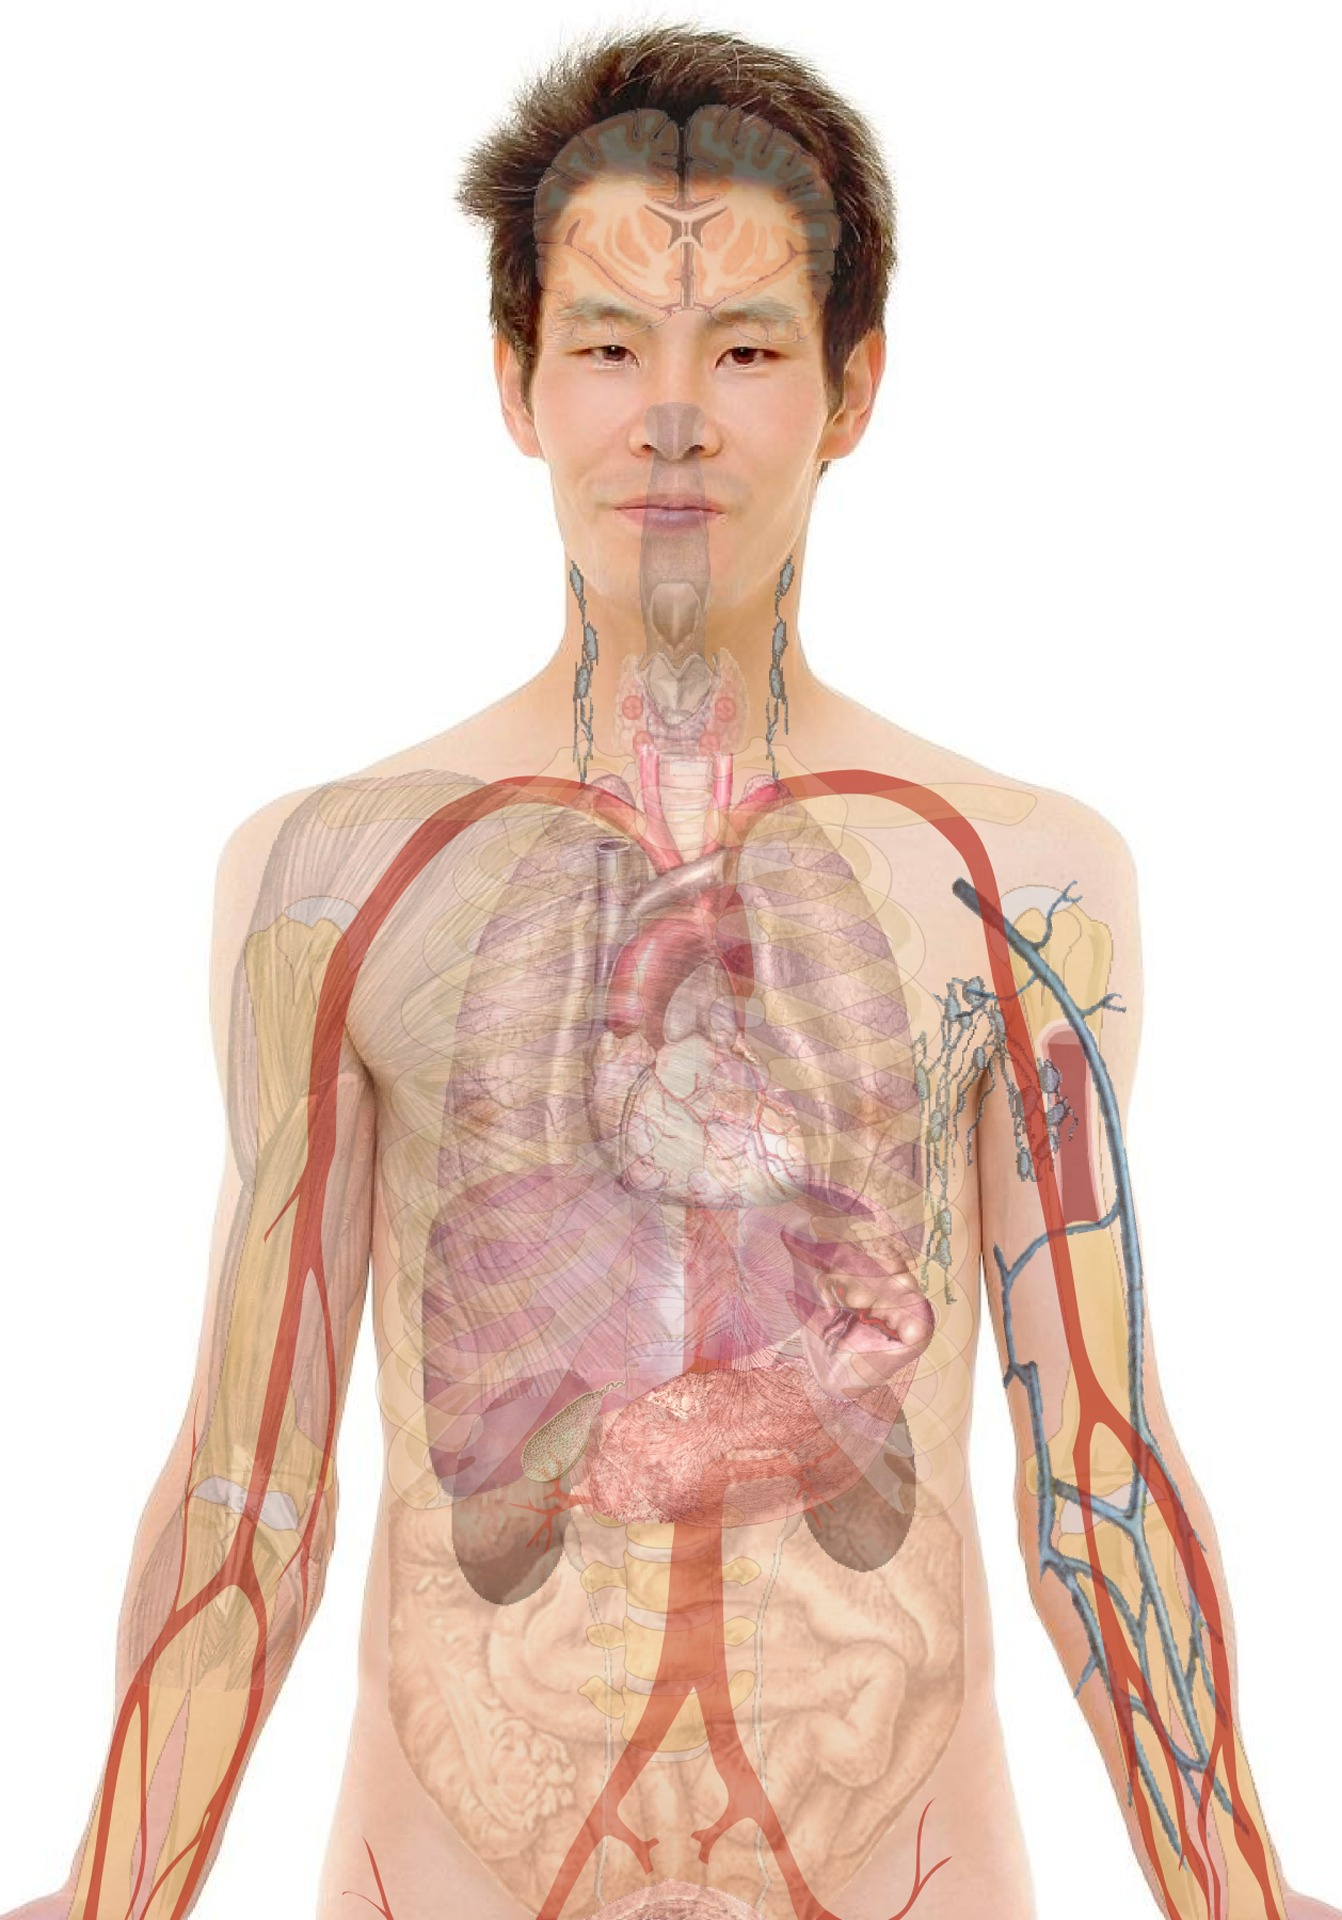 Opisthorchiasis diphyllobothriasis - Hogyan fertőzhetek meg?